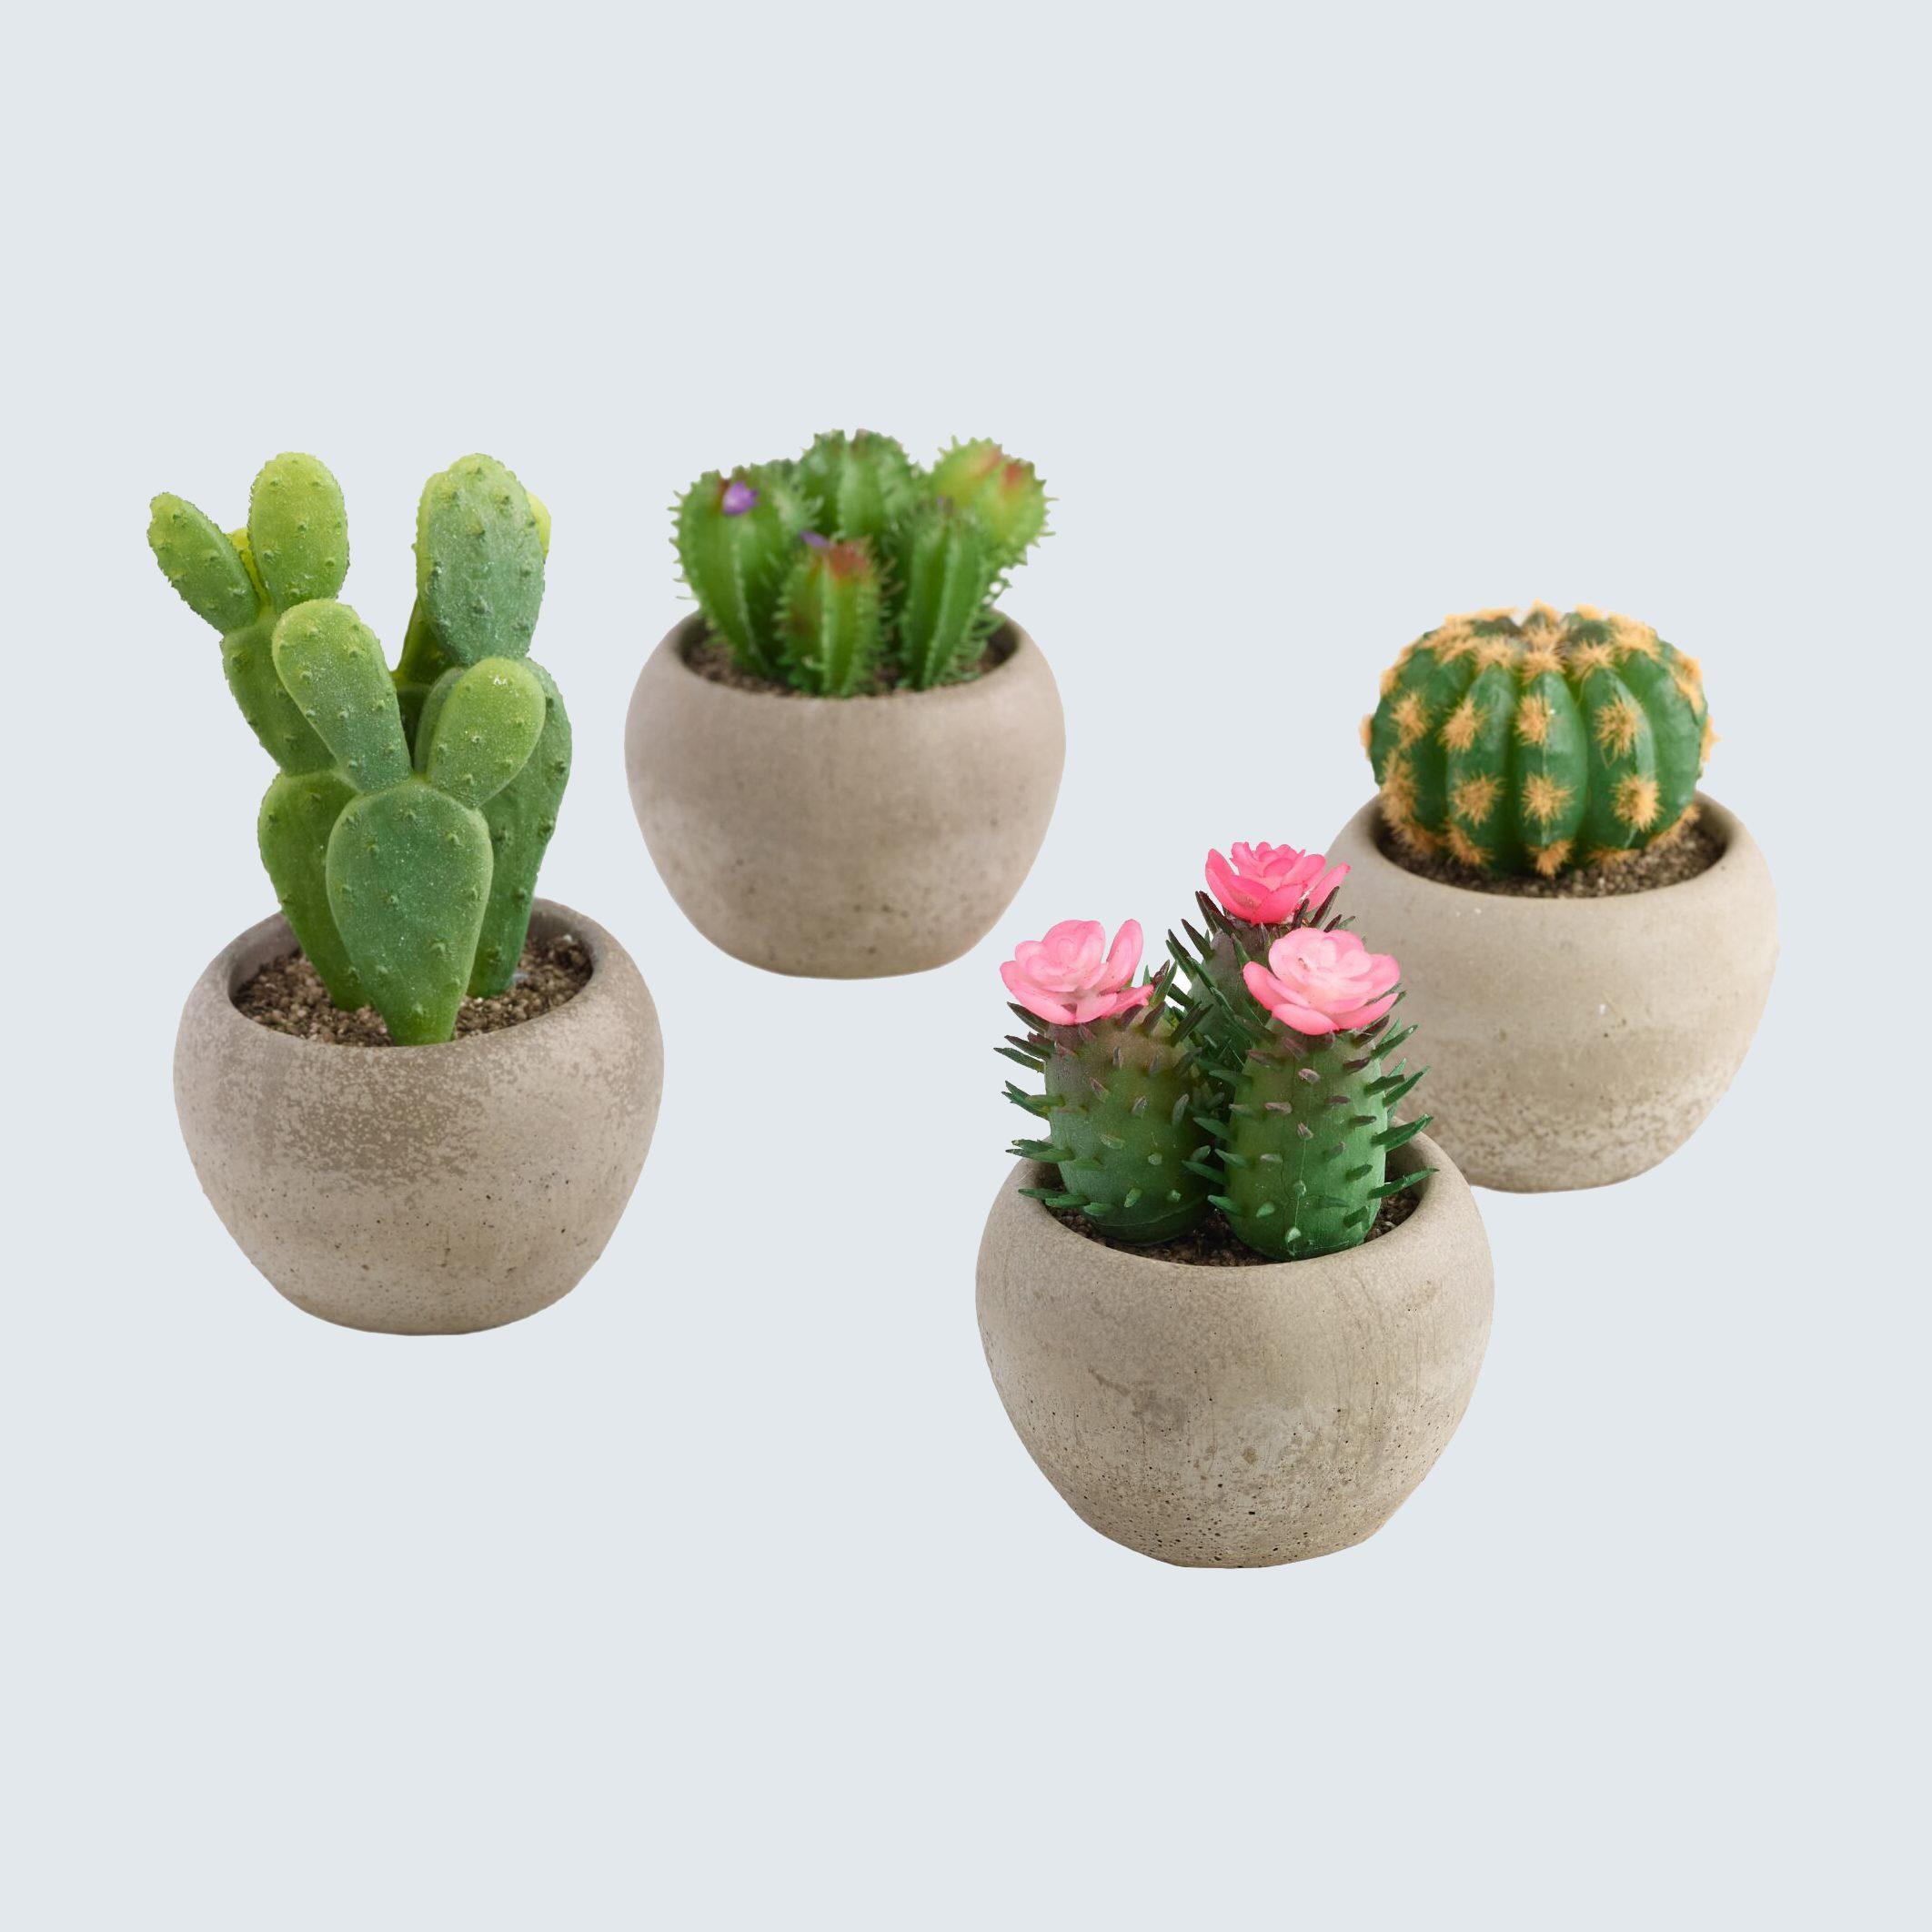 Assorted fake cacti